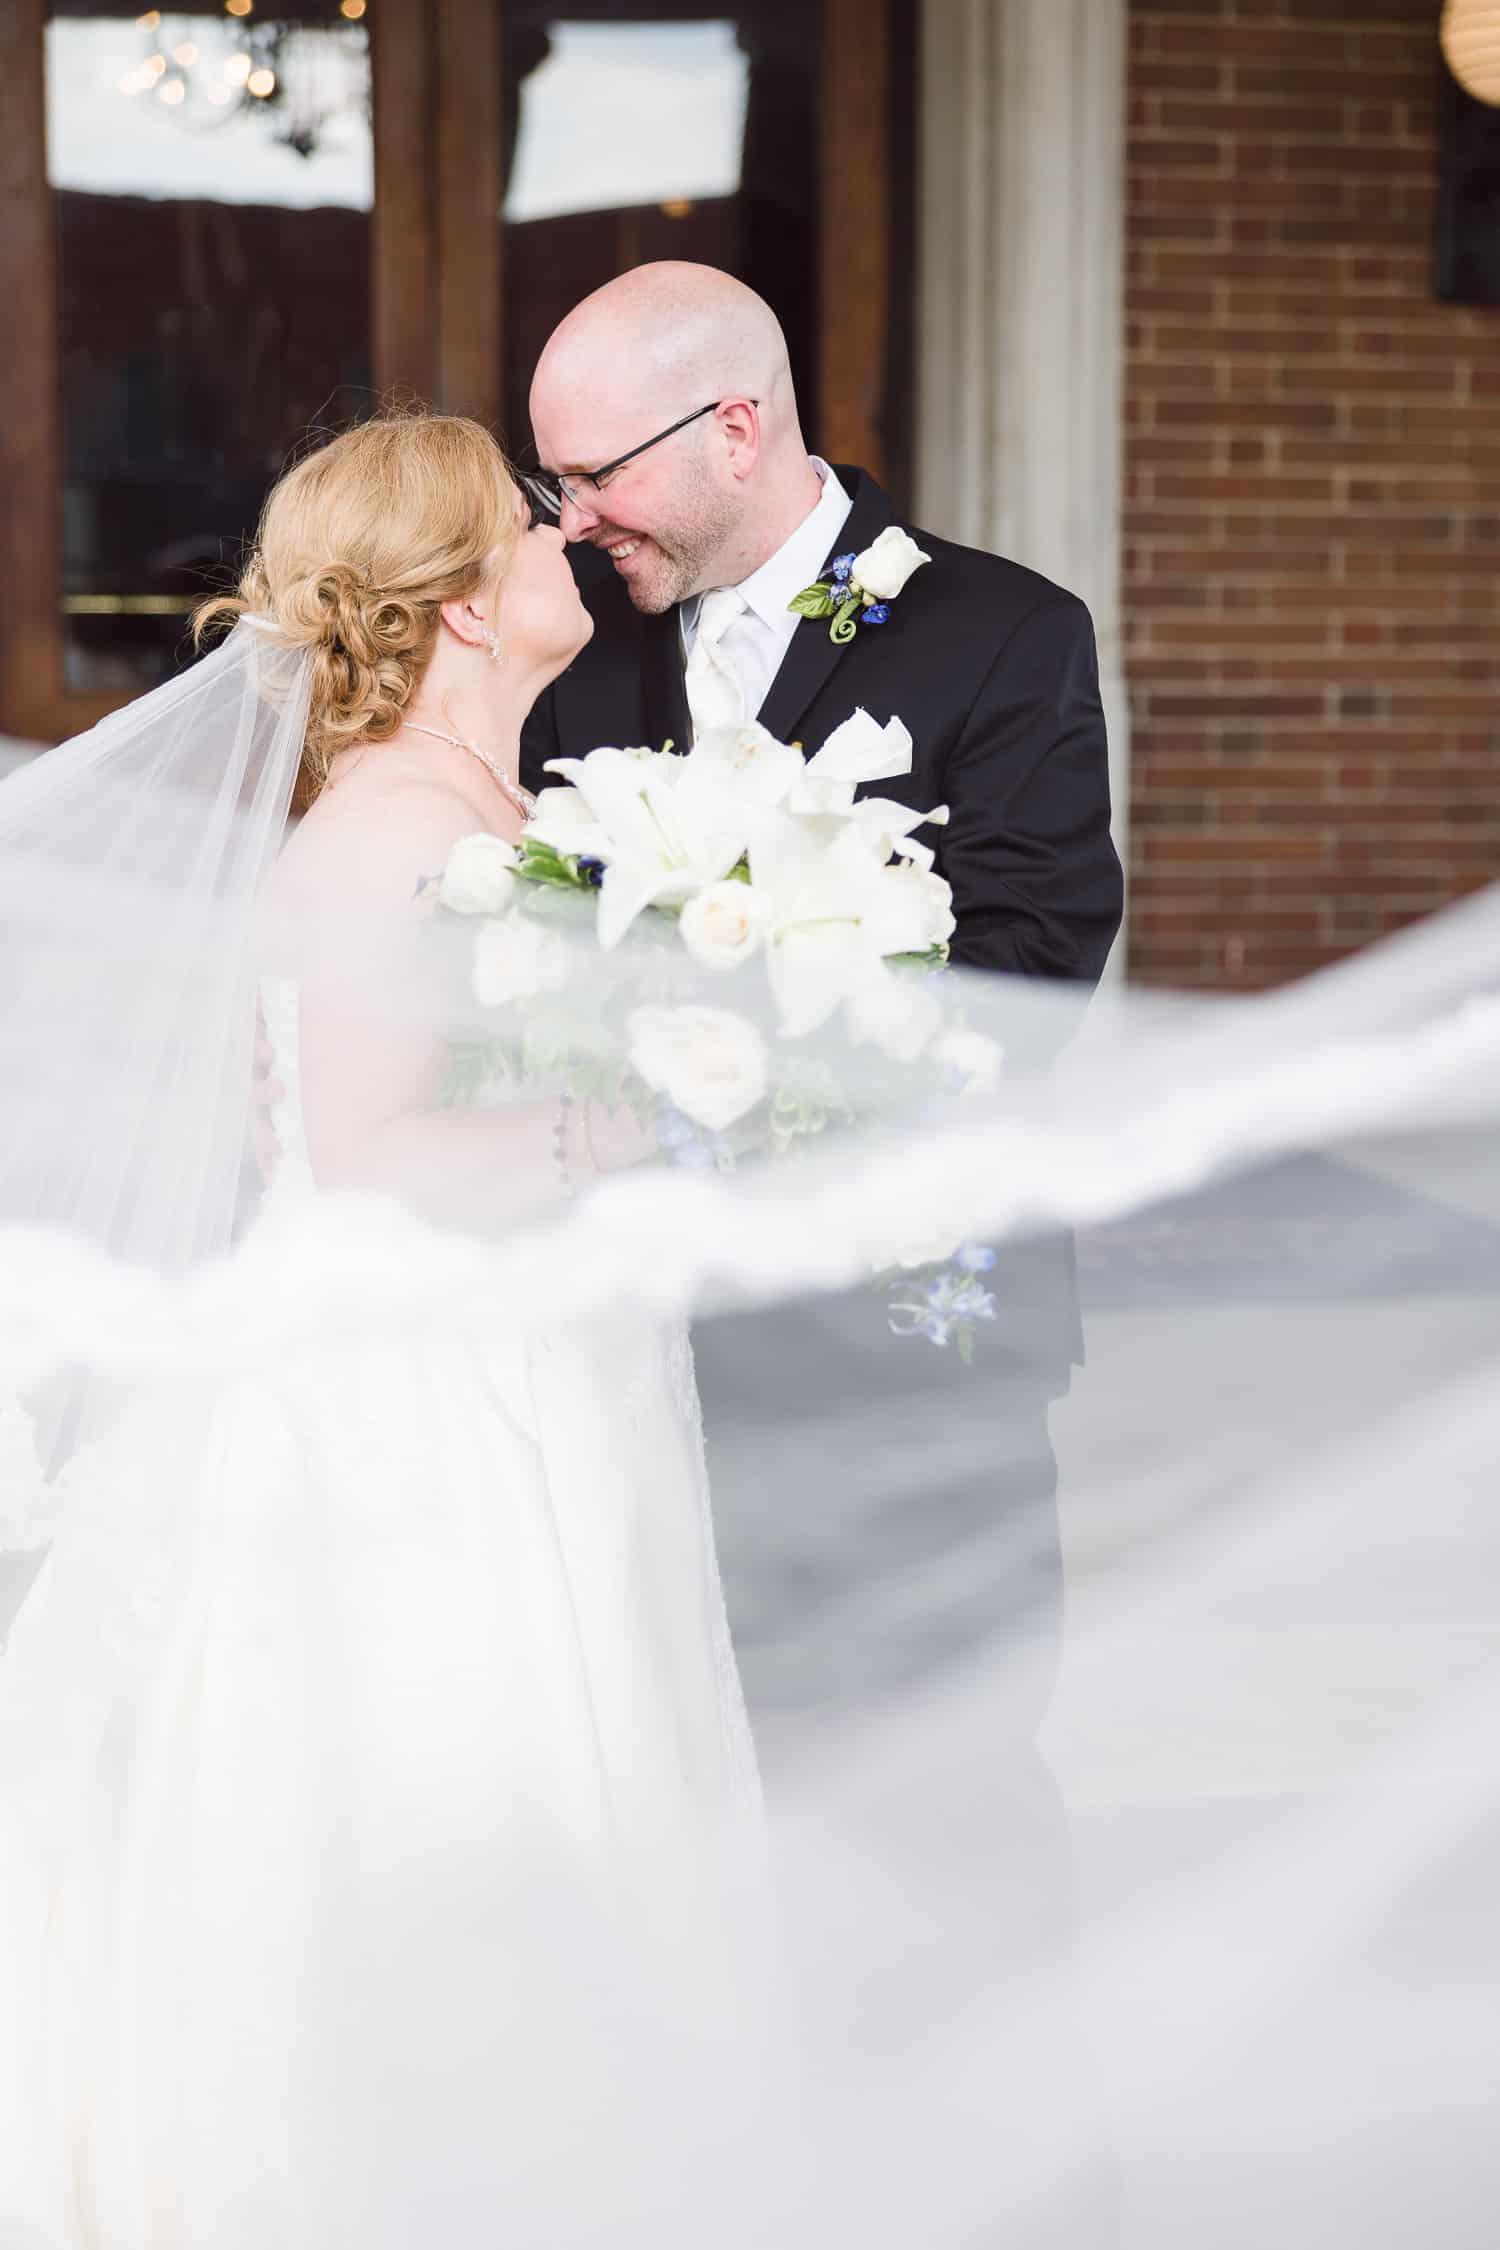 Loose Mansion wedding reception veil photo